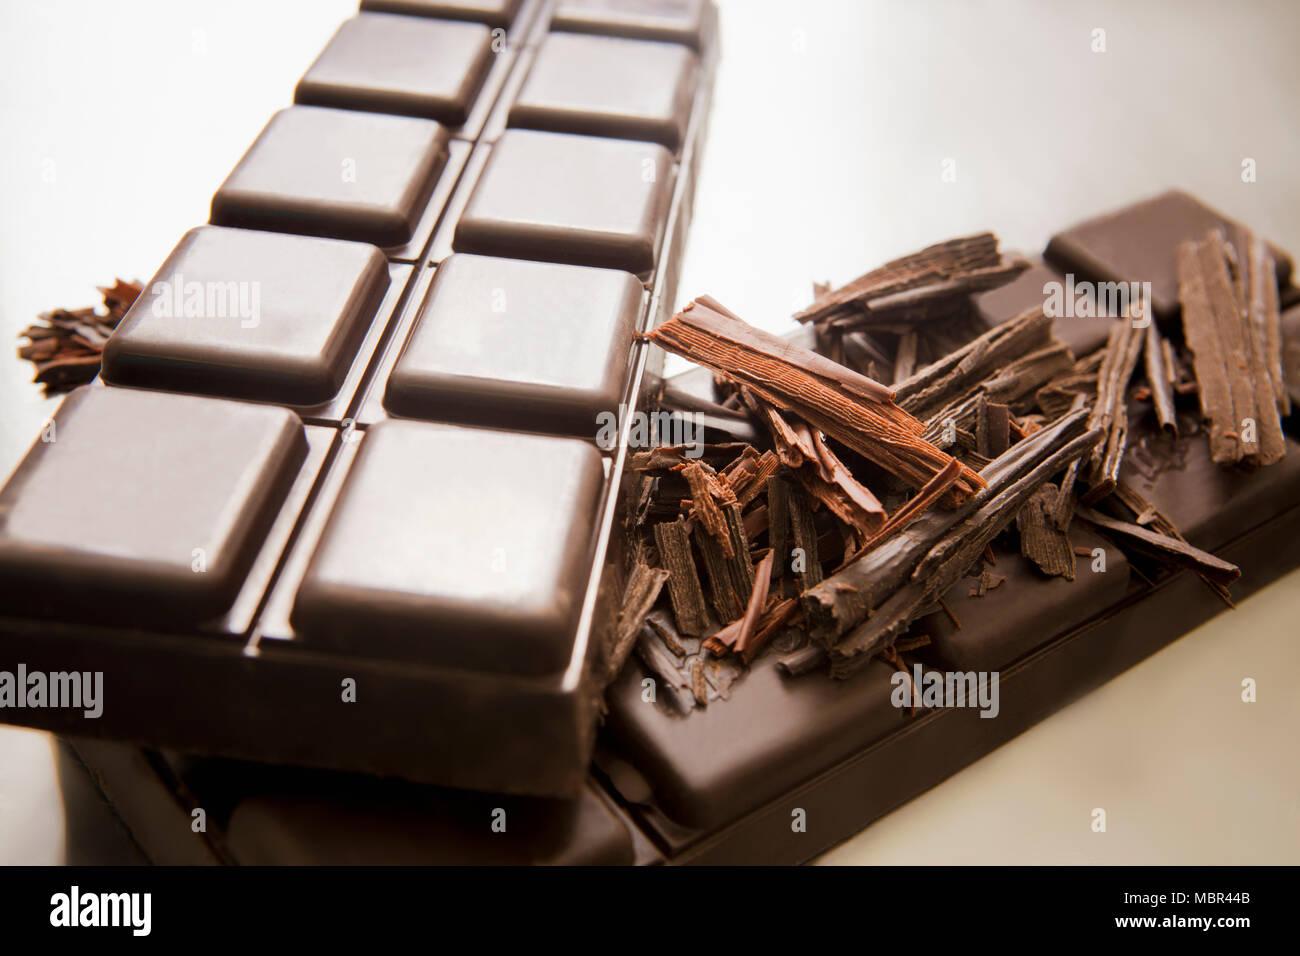 Chocolate Bar and Chocolates Curls - Stock Image